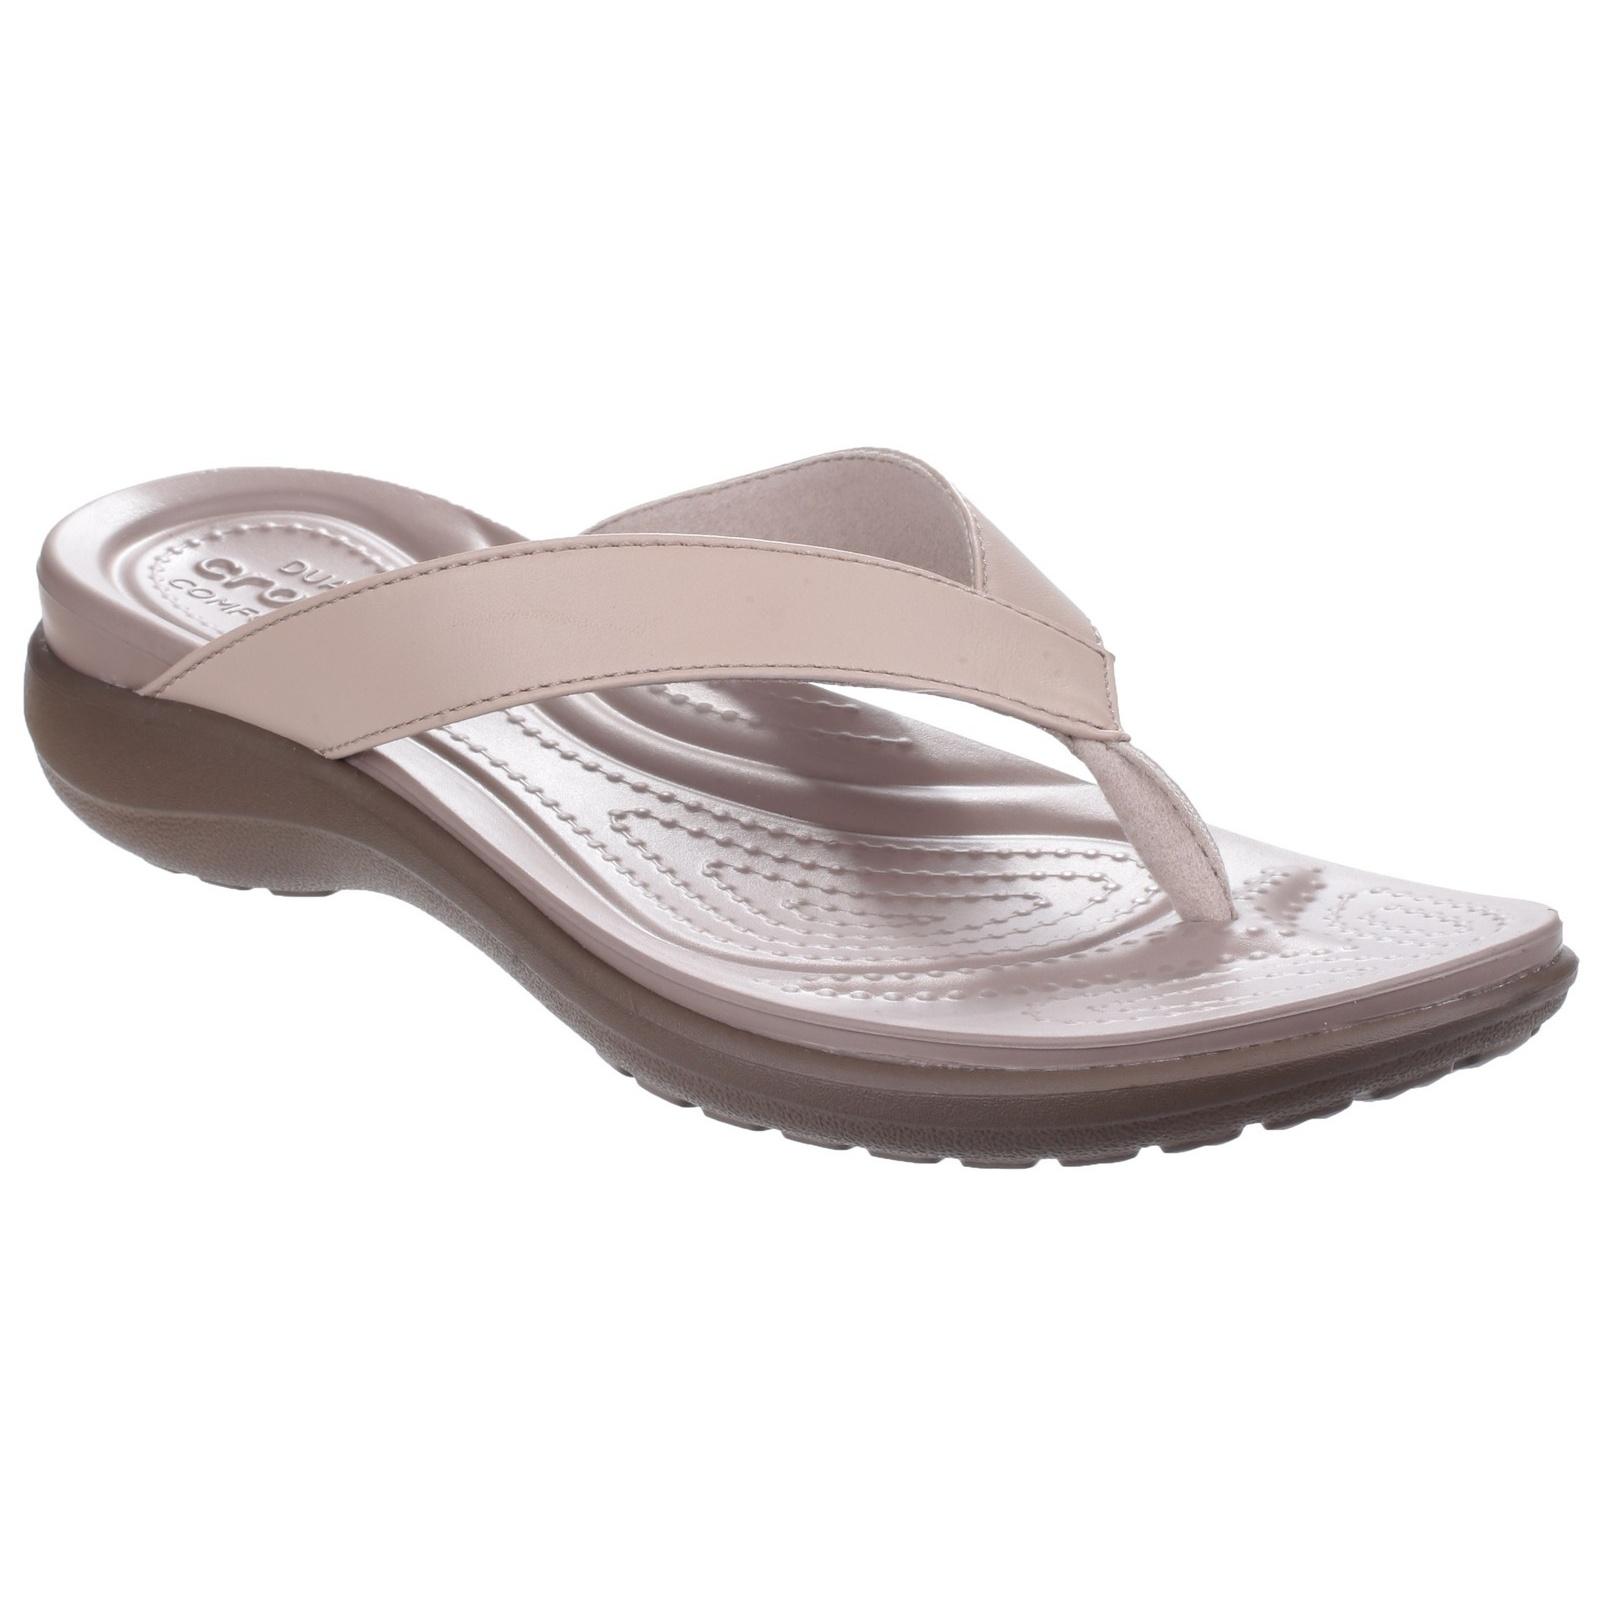 crocs womens ladies capri v summer flip flops ebay. Black Bedroom Furniture Sets. Home Design Ideas